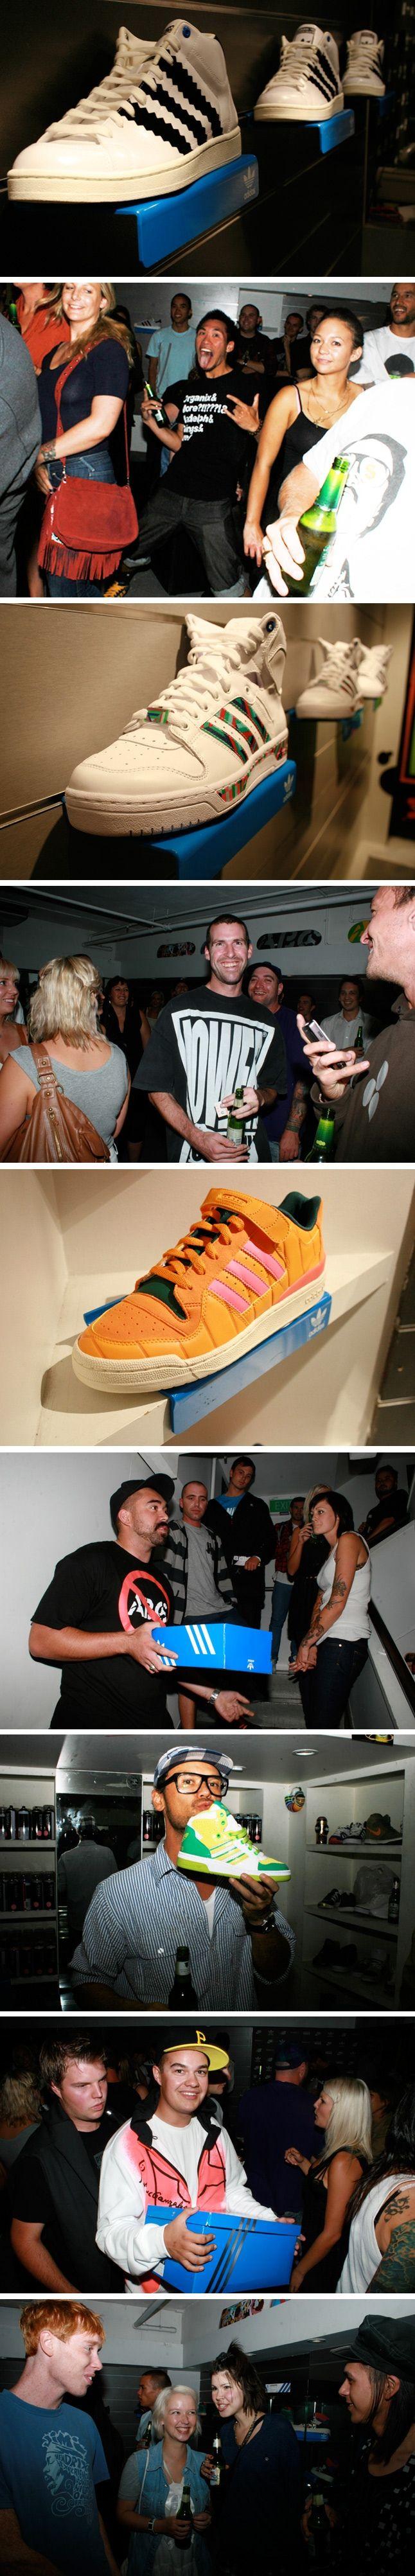 Loaded Adidas Launch Pics 1